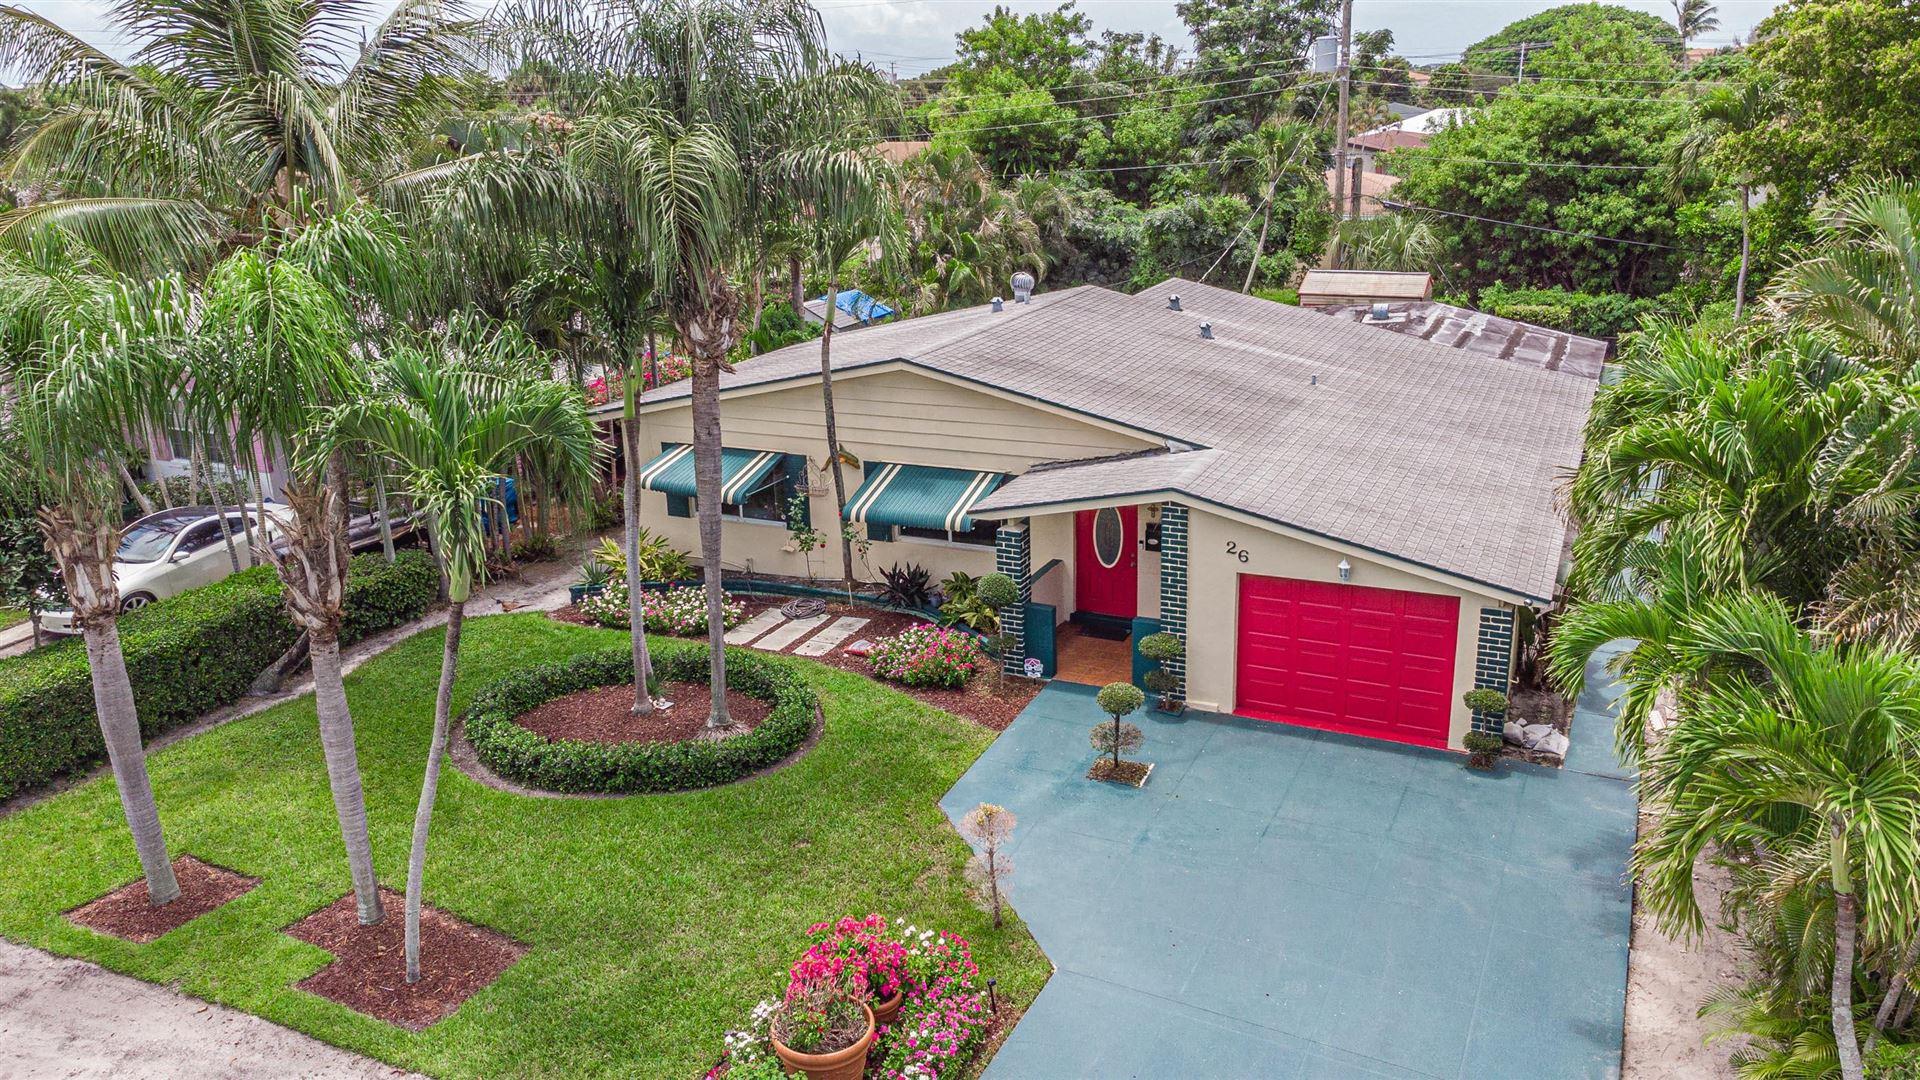 26 SW 8 Street, Delray Beach, FL 33444 - MLS#: RX-10729120